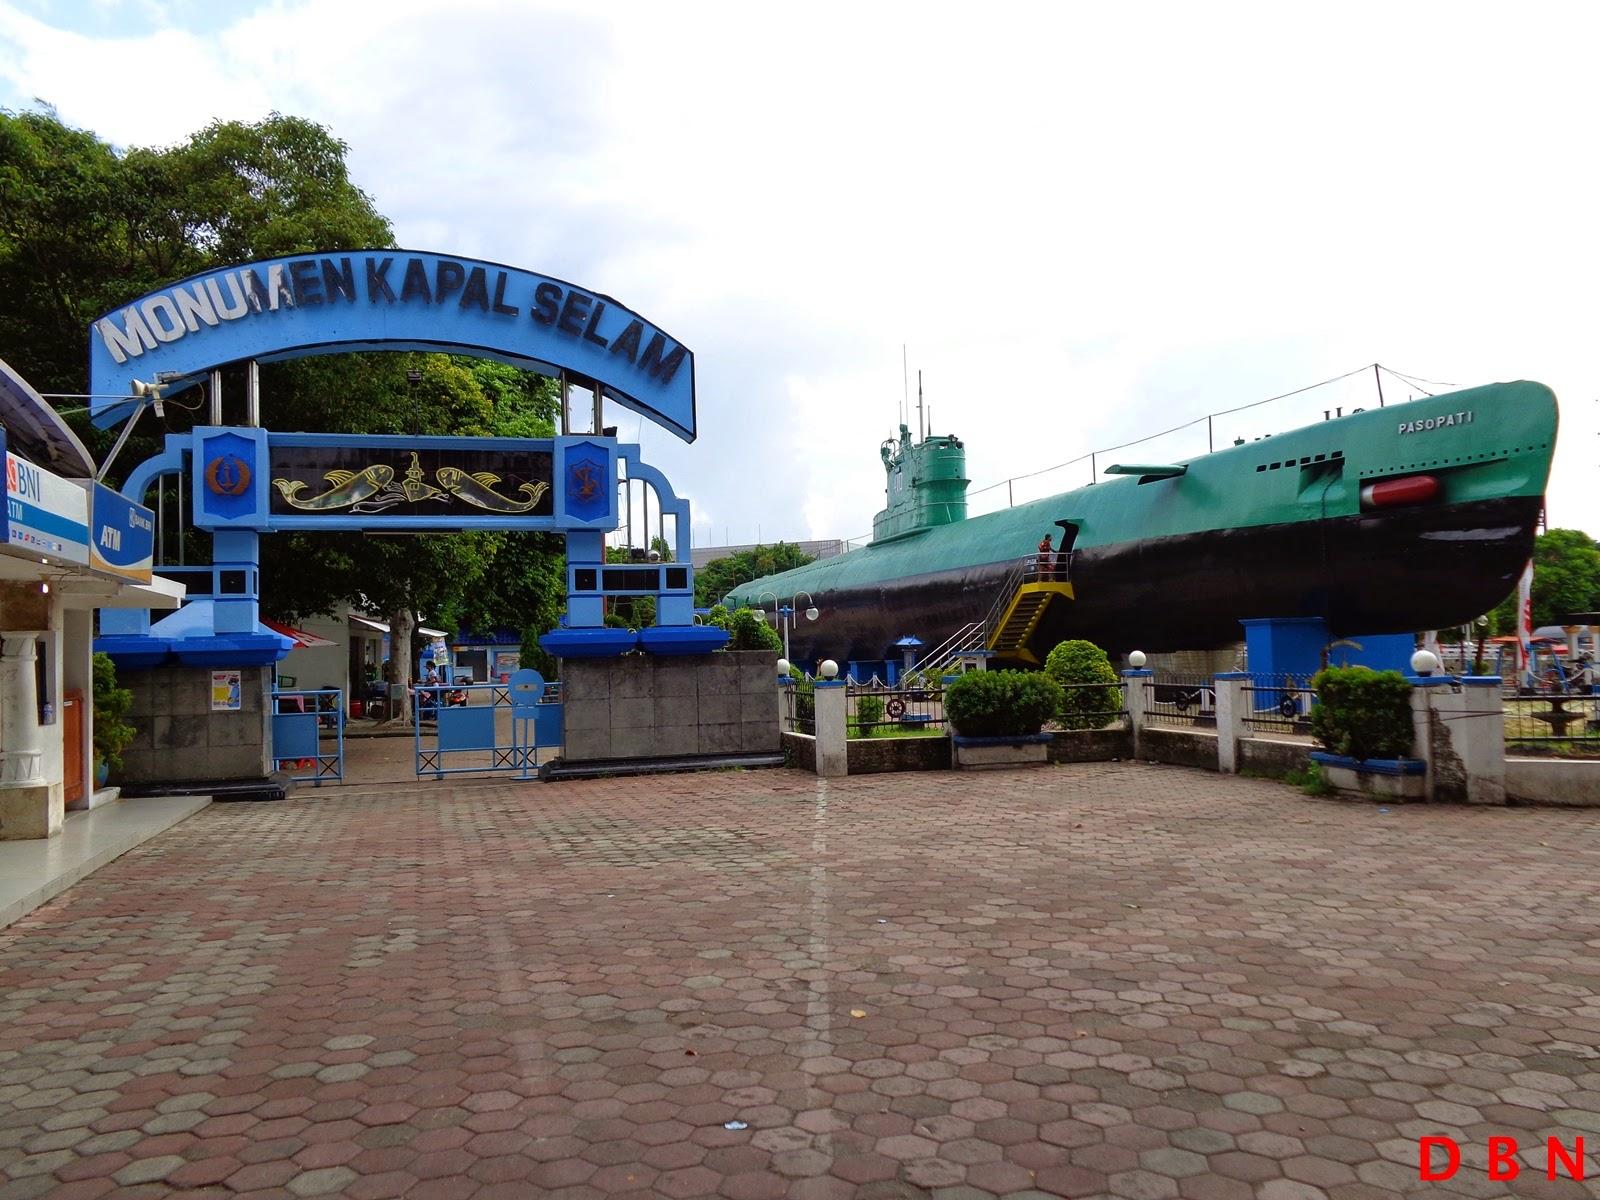 Journey Life Berkunjung Monumen Kapal Selam Surabaya Satu Objek Wisata